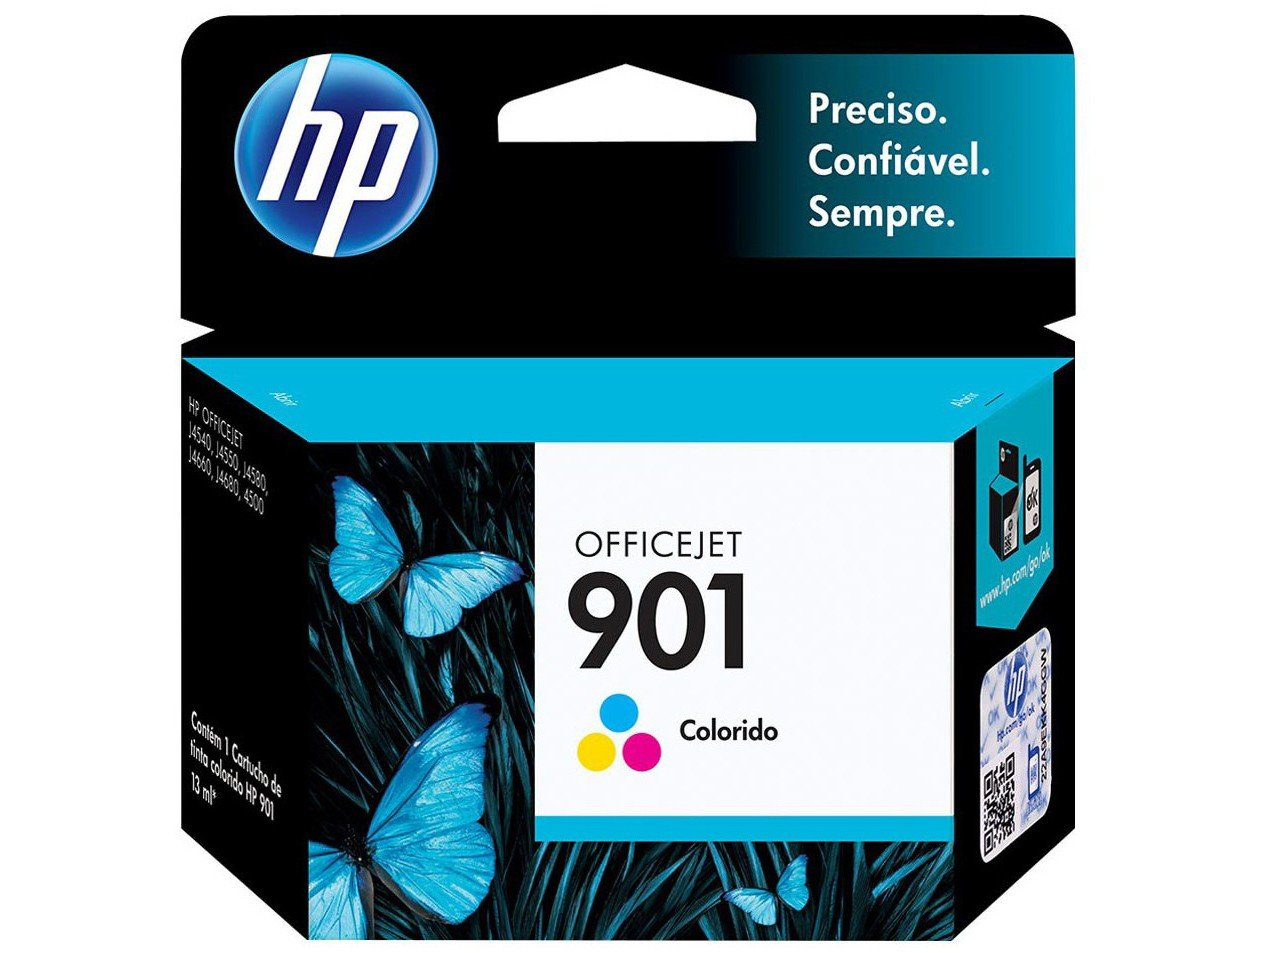 Foto 1 - Cartucho de Tinta HP Colorido 901 Officejet - Original